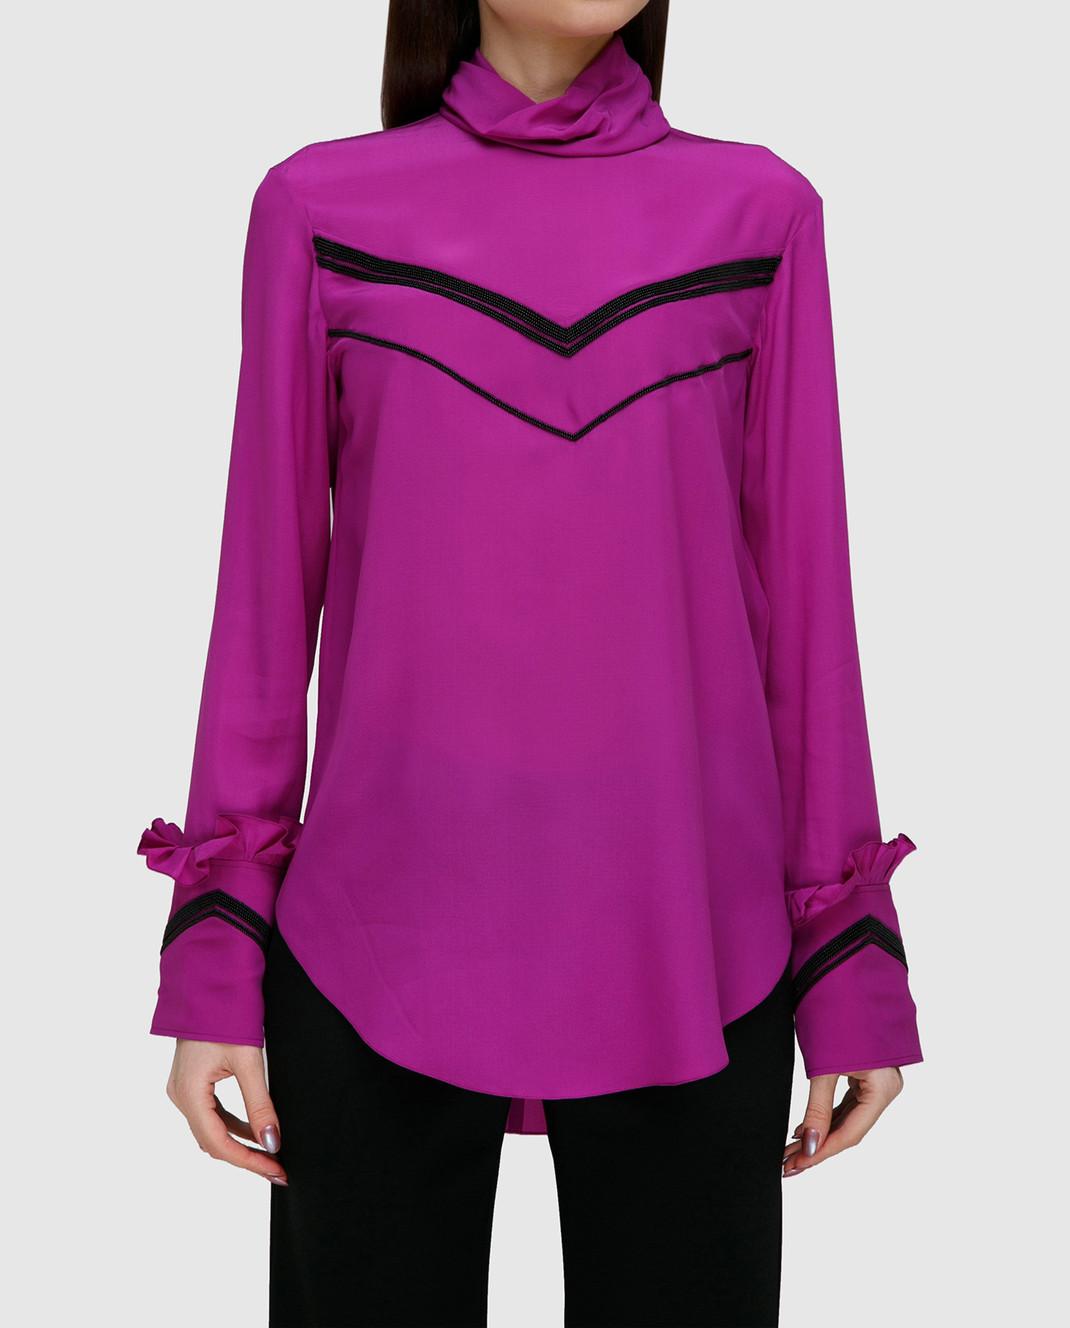 NINA RICCI Розовая блуза из шелка 17PCTO016SE0801 изображение 3